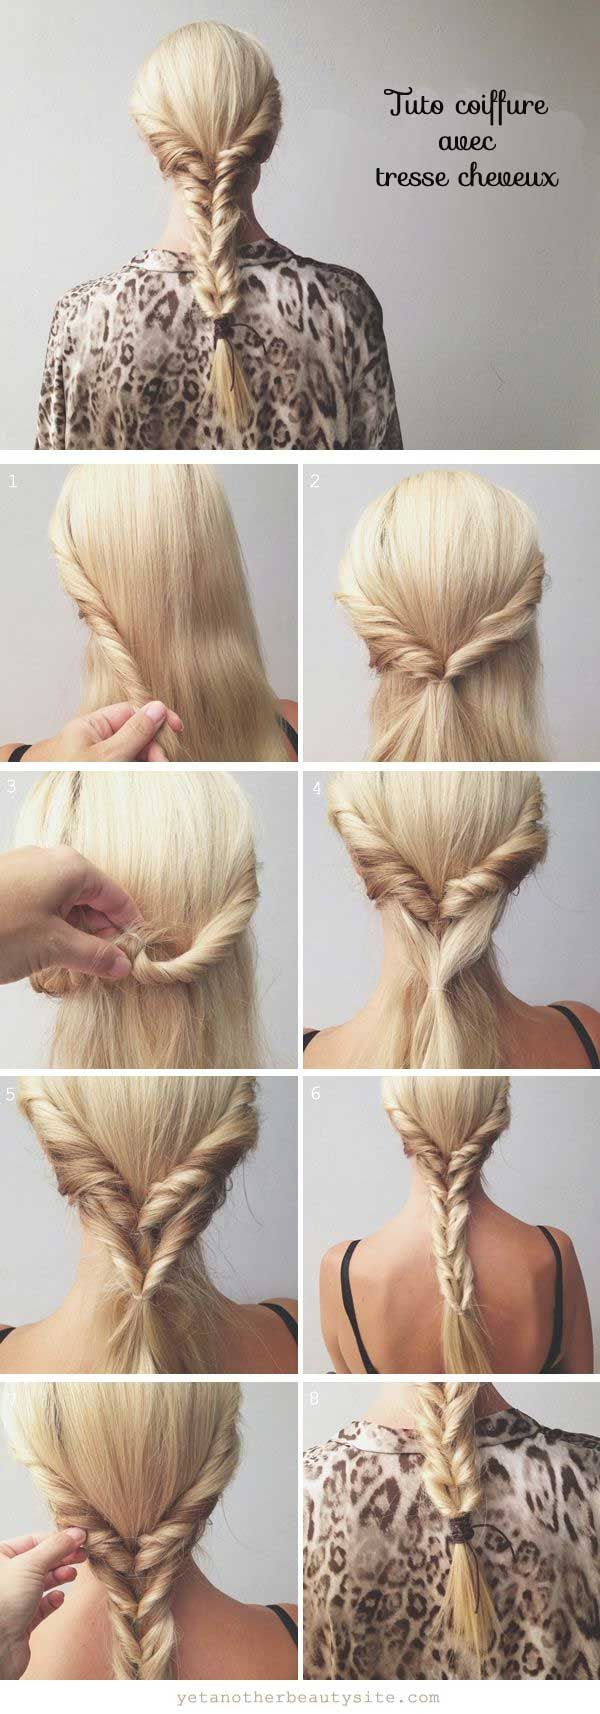 Tuto coiffure facile cheveux longs courts Tuto coiffure